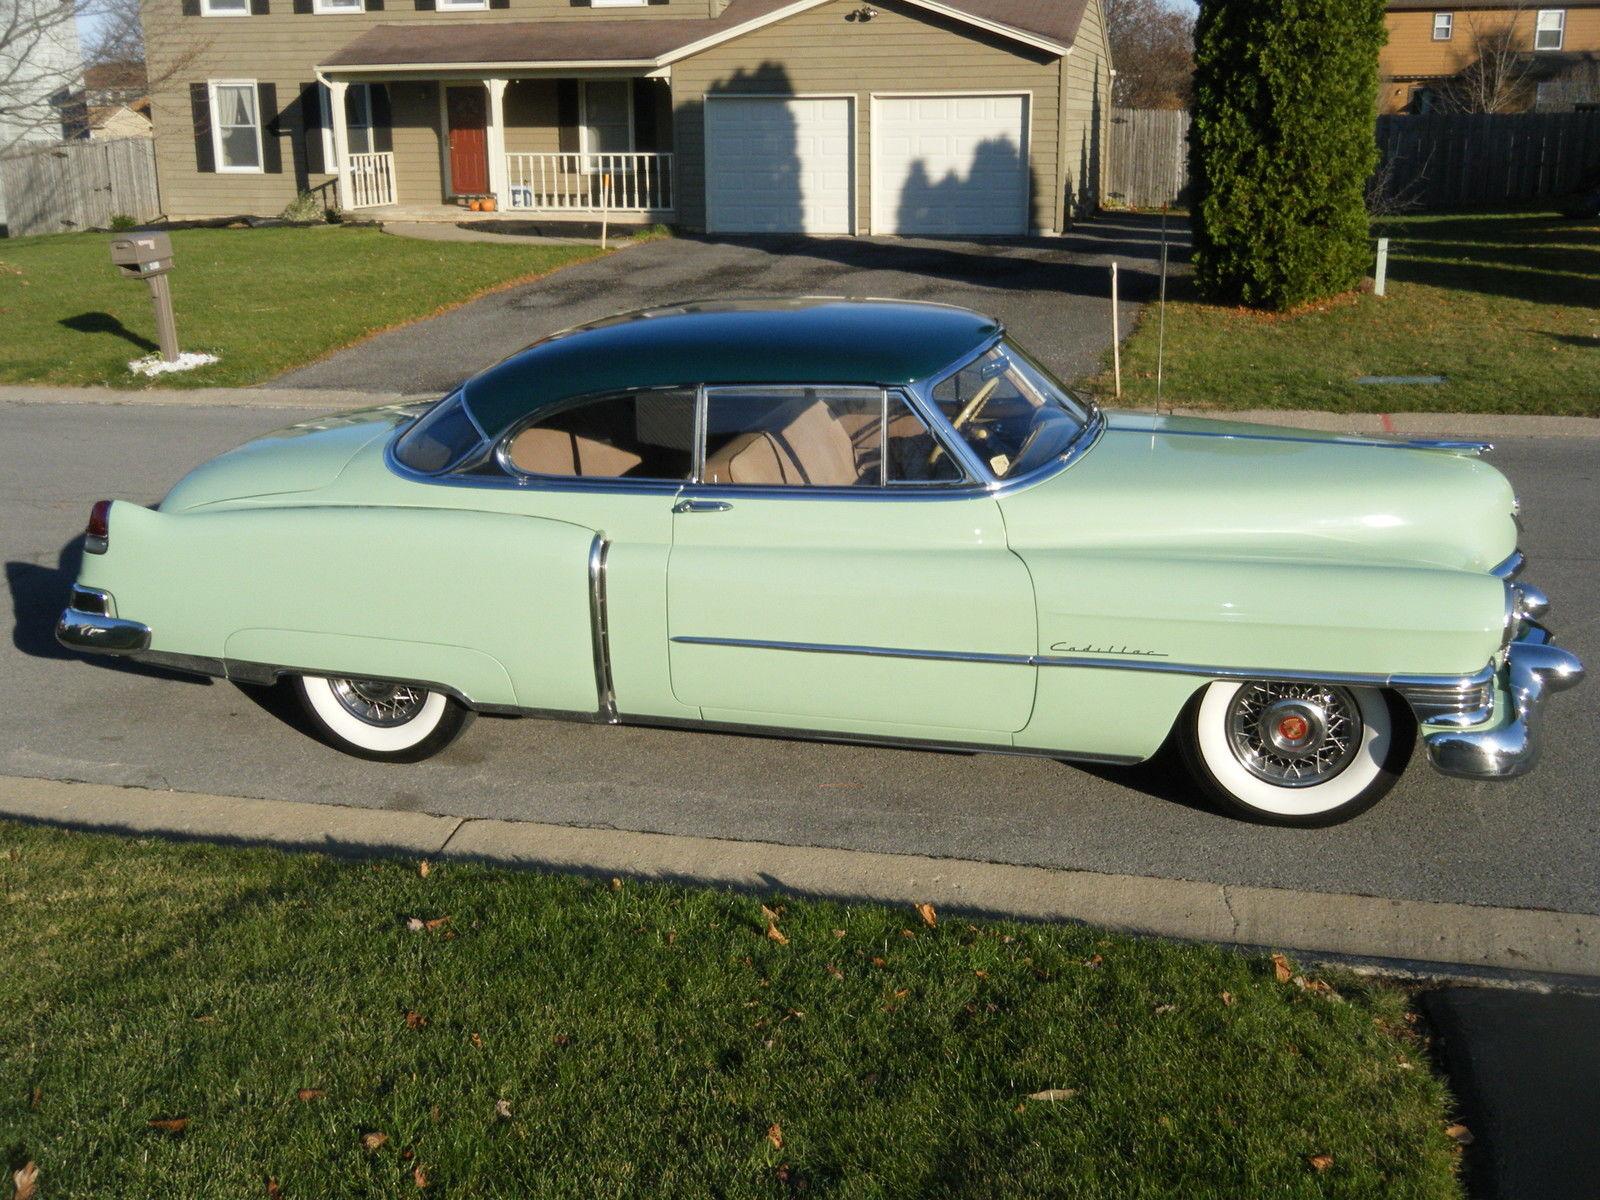 1951 Cadillac Coupe Rare Original Time Capsule 1950 1952 1953 Fleetwood 60 Special 1959 1960